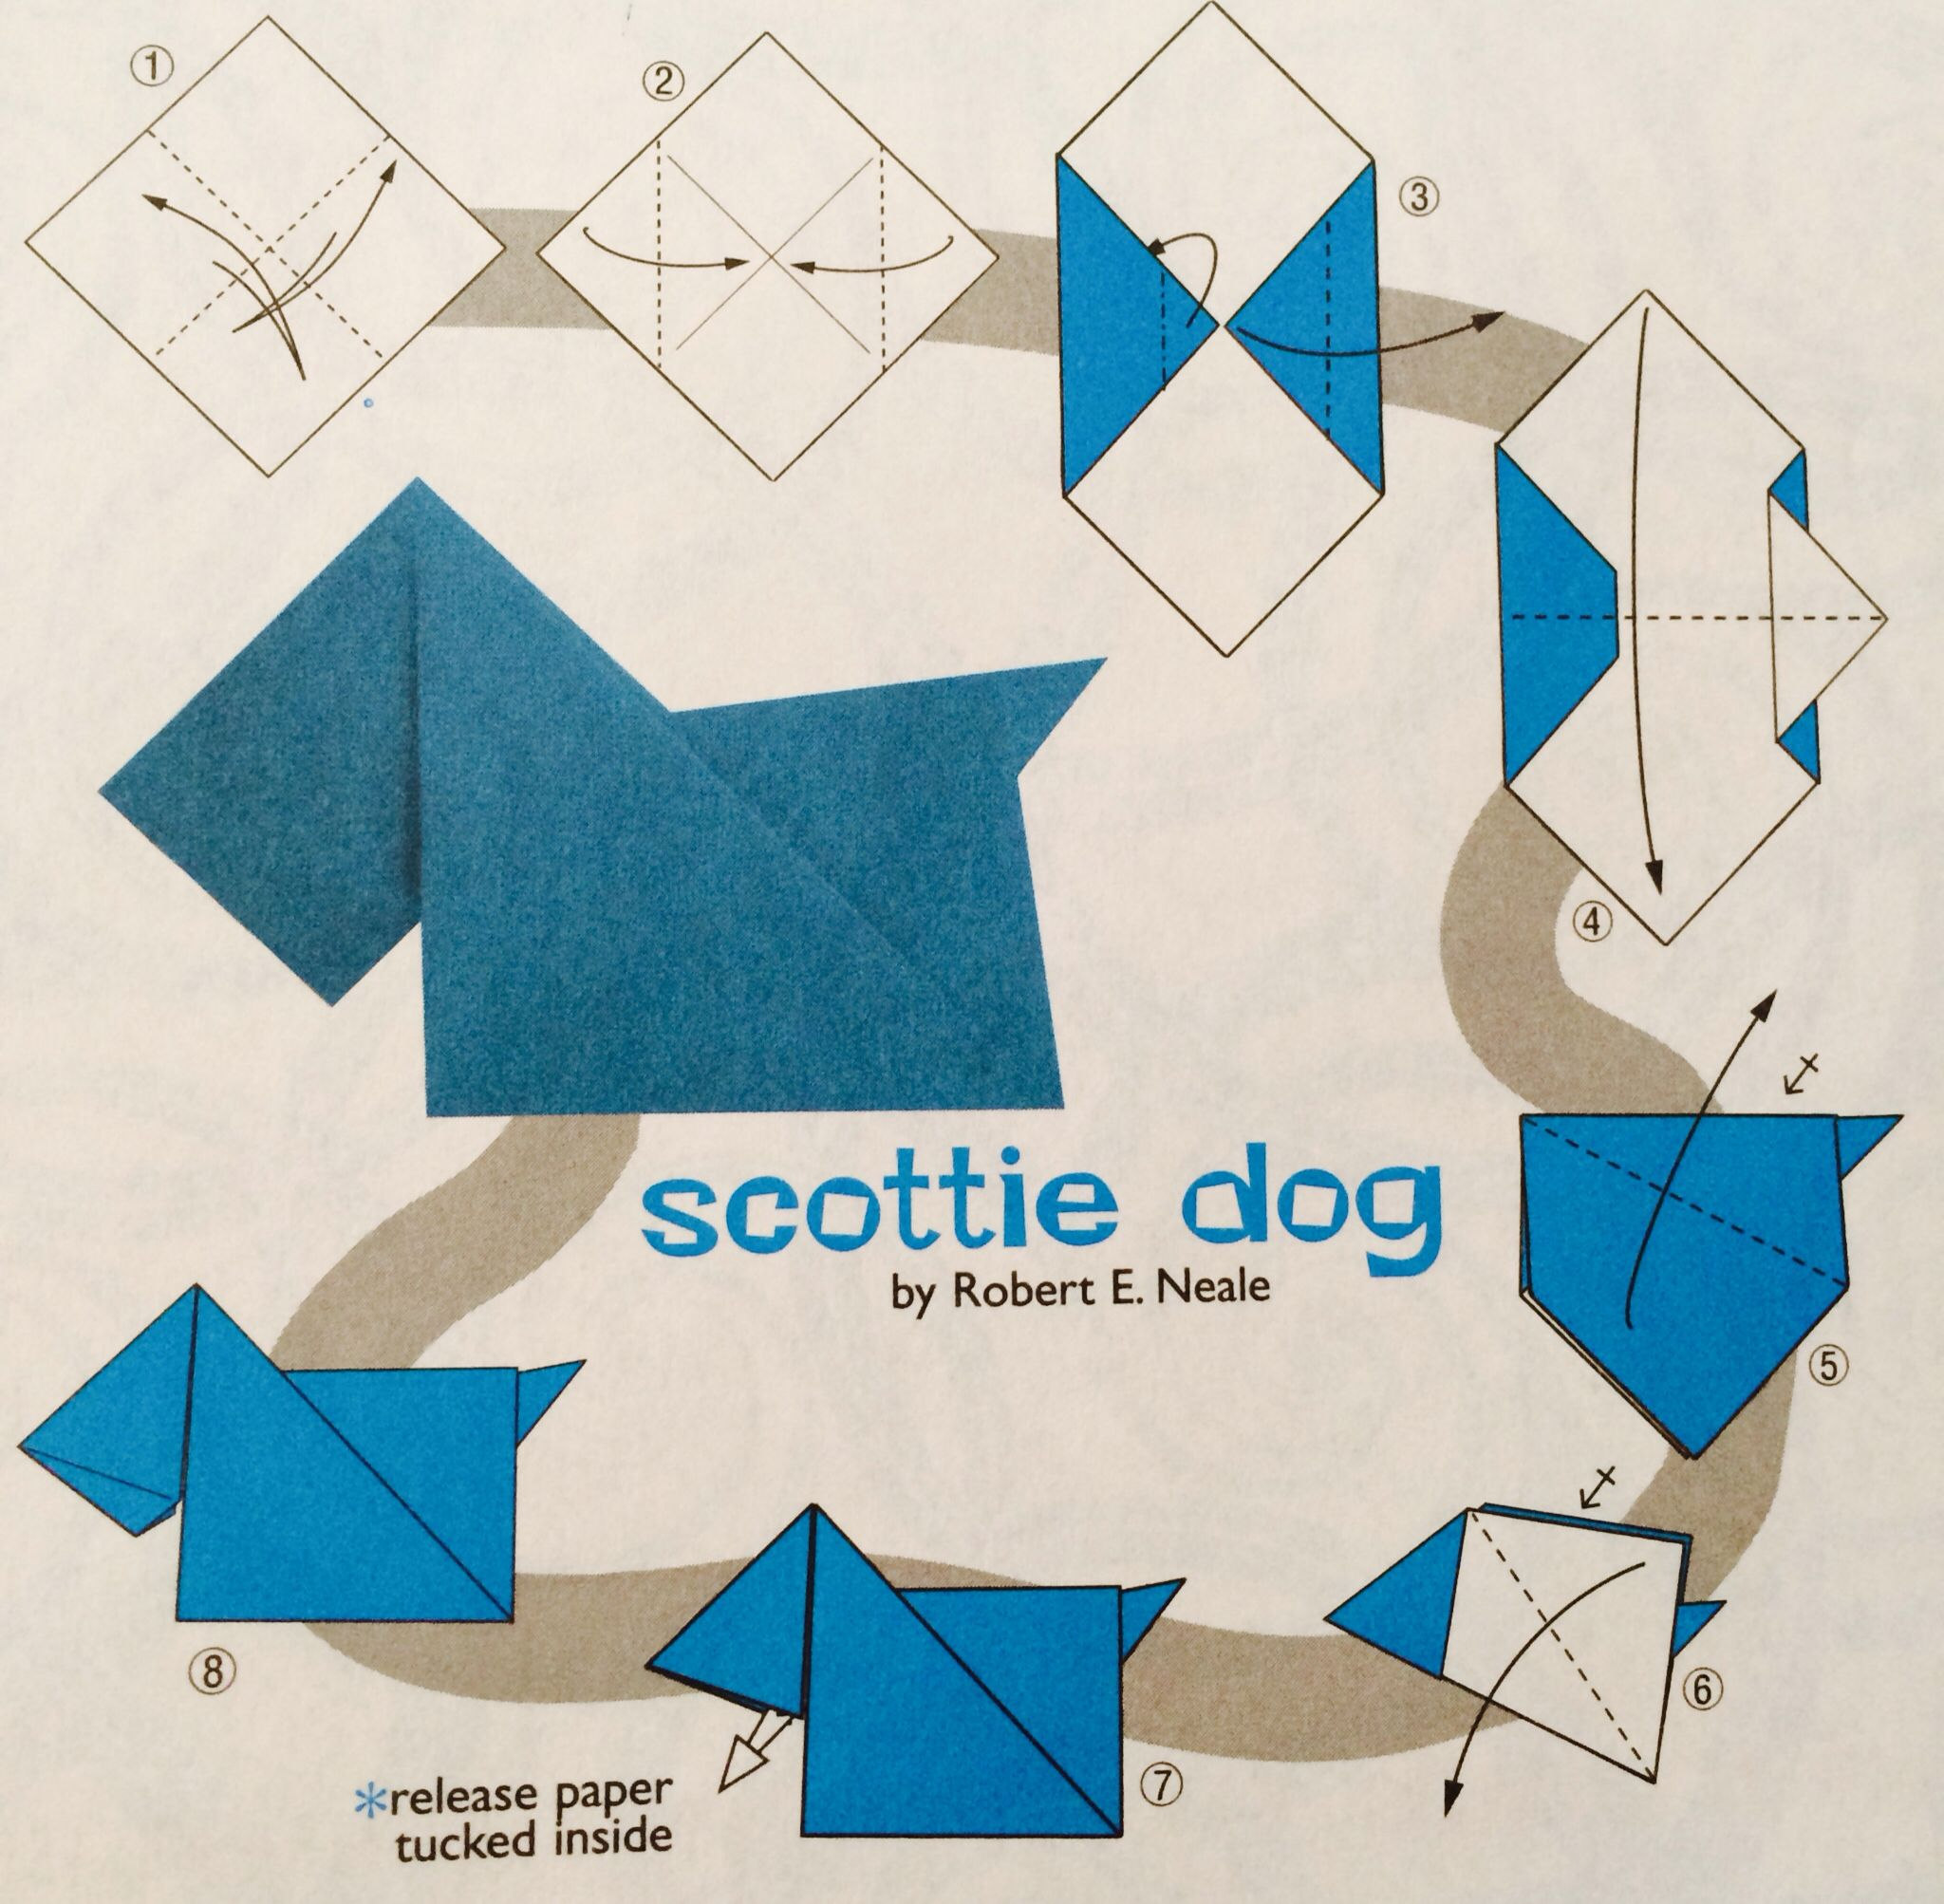 origami diagram motorcycle 2003 nissan xterra radio wiring scottie dog crafts paper pinterest